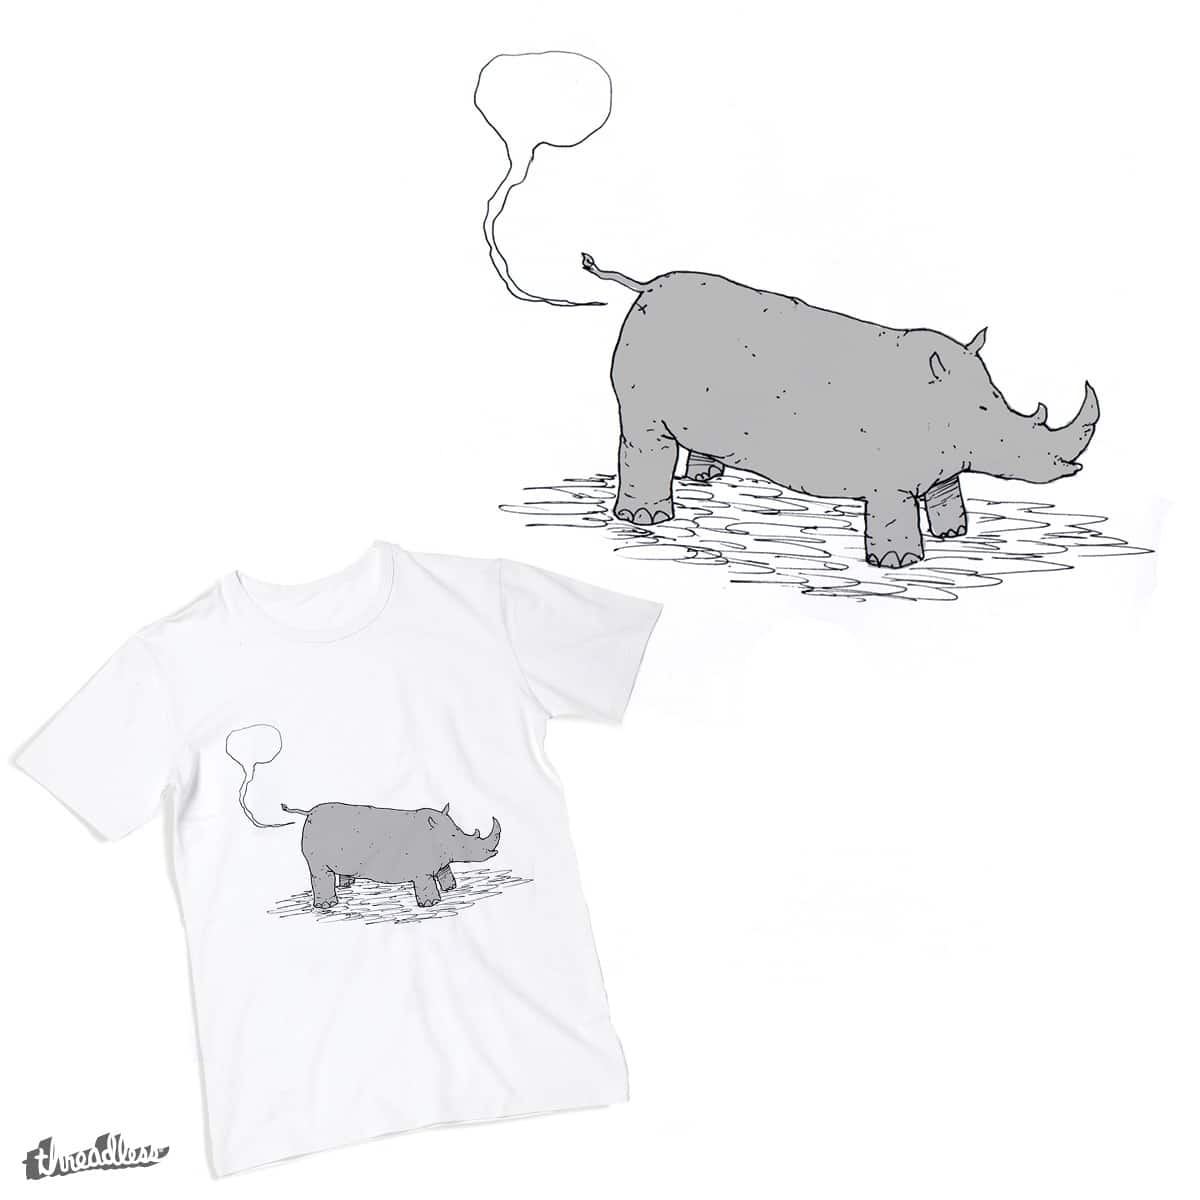 rhino fart by Pimaind on Threadless